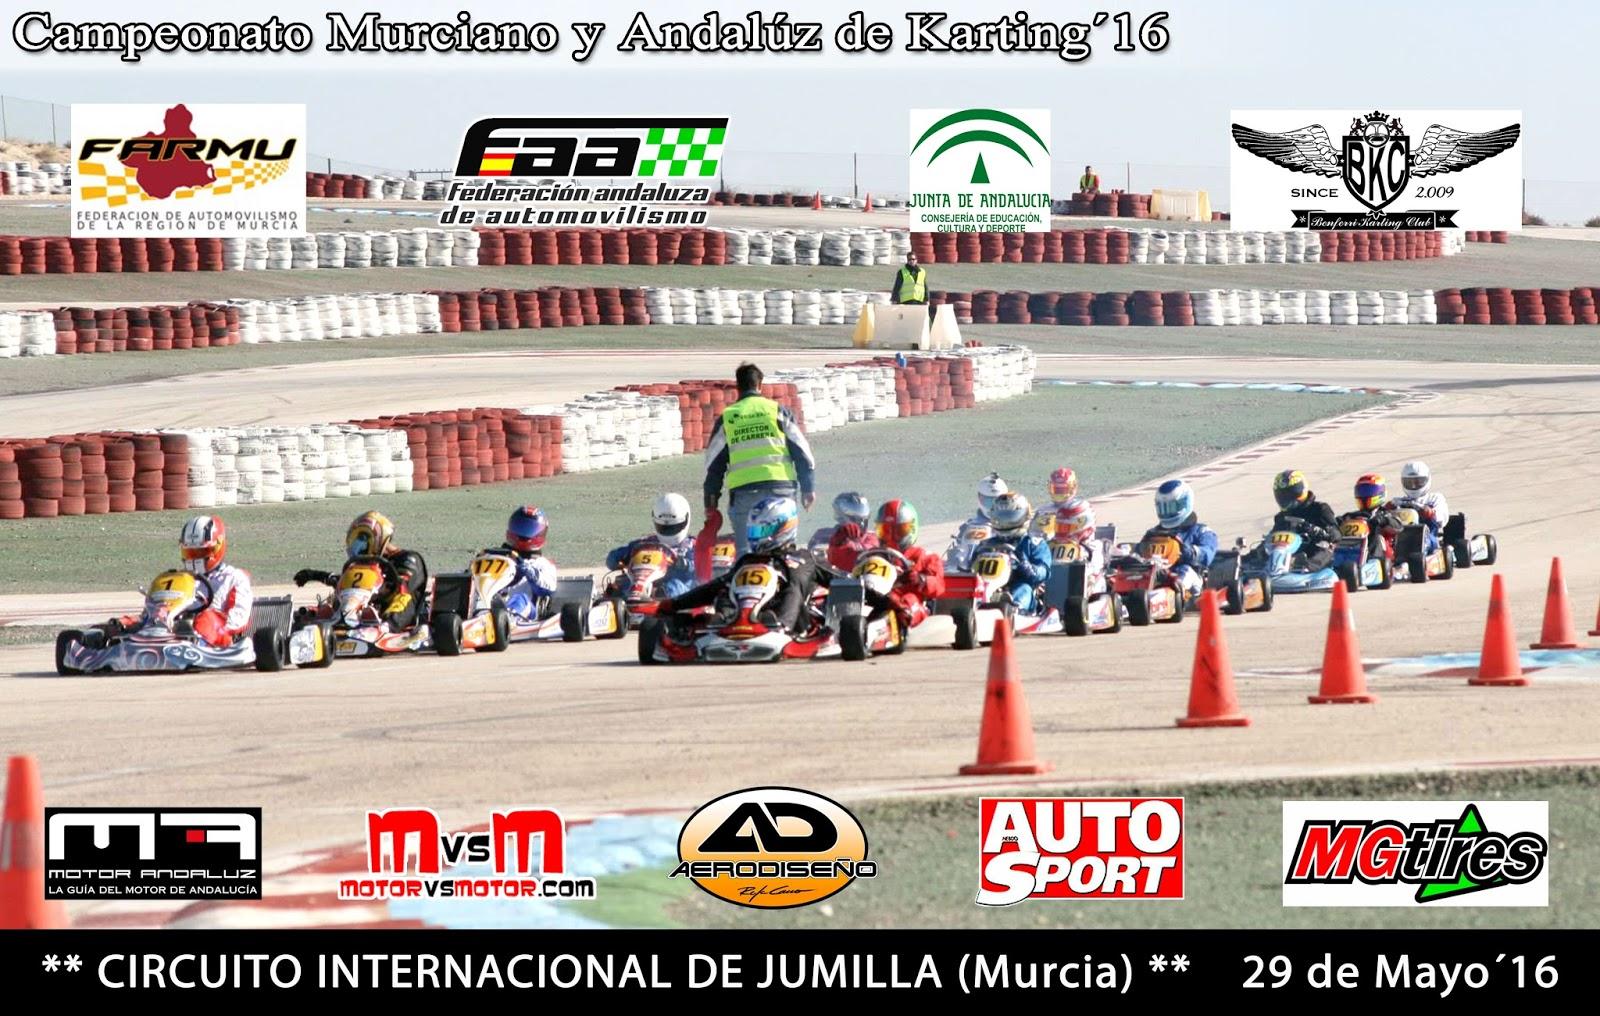 Circuito Jumilla : Benferri karting club: avance campeonato murciano y andaluz de karting